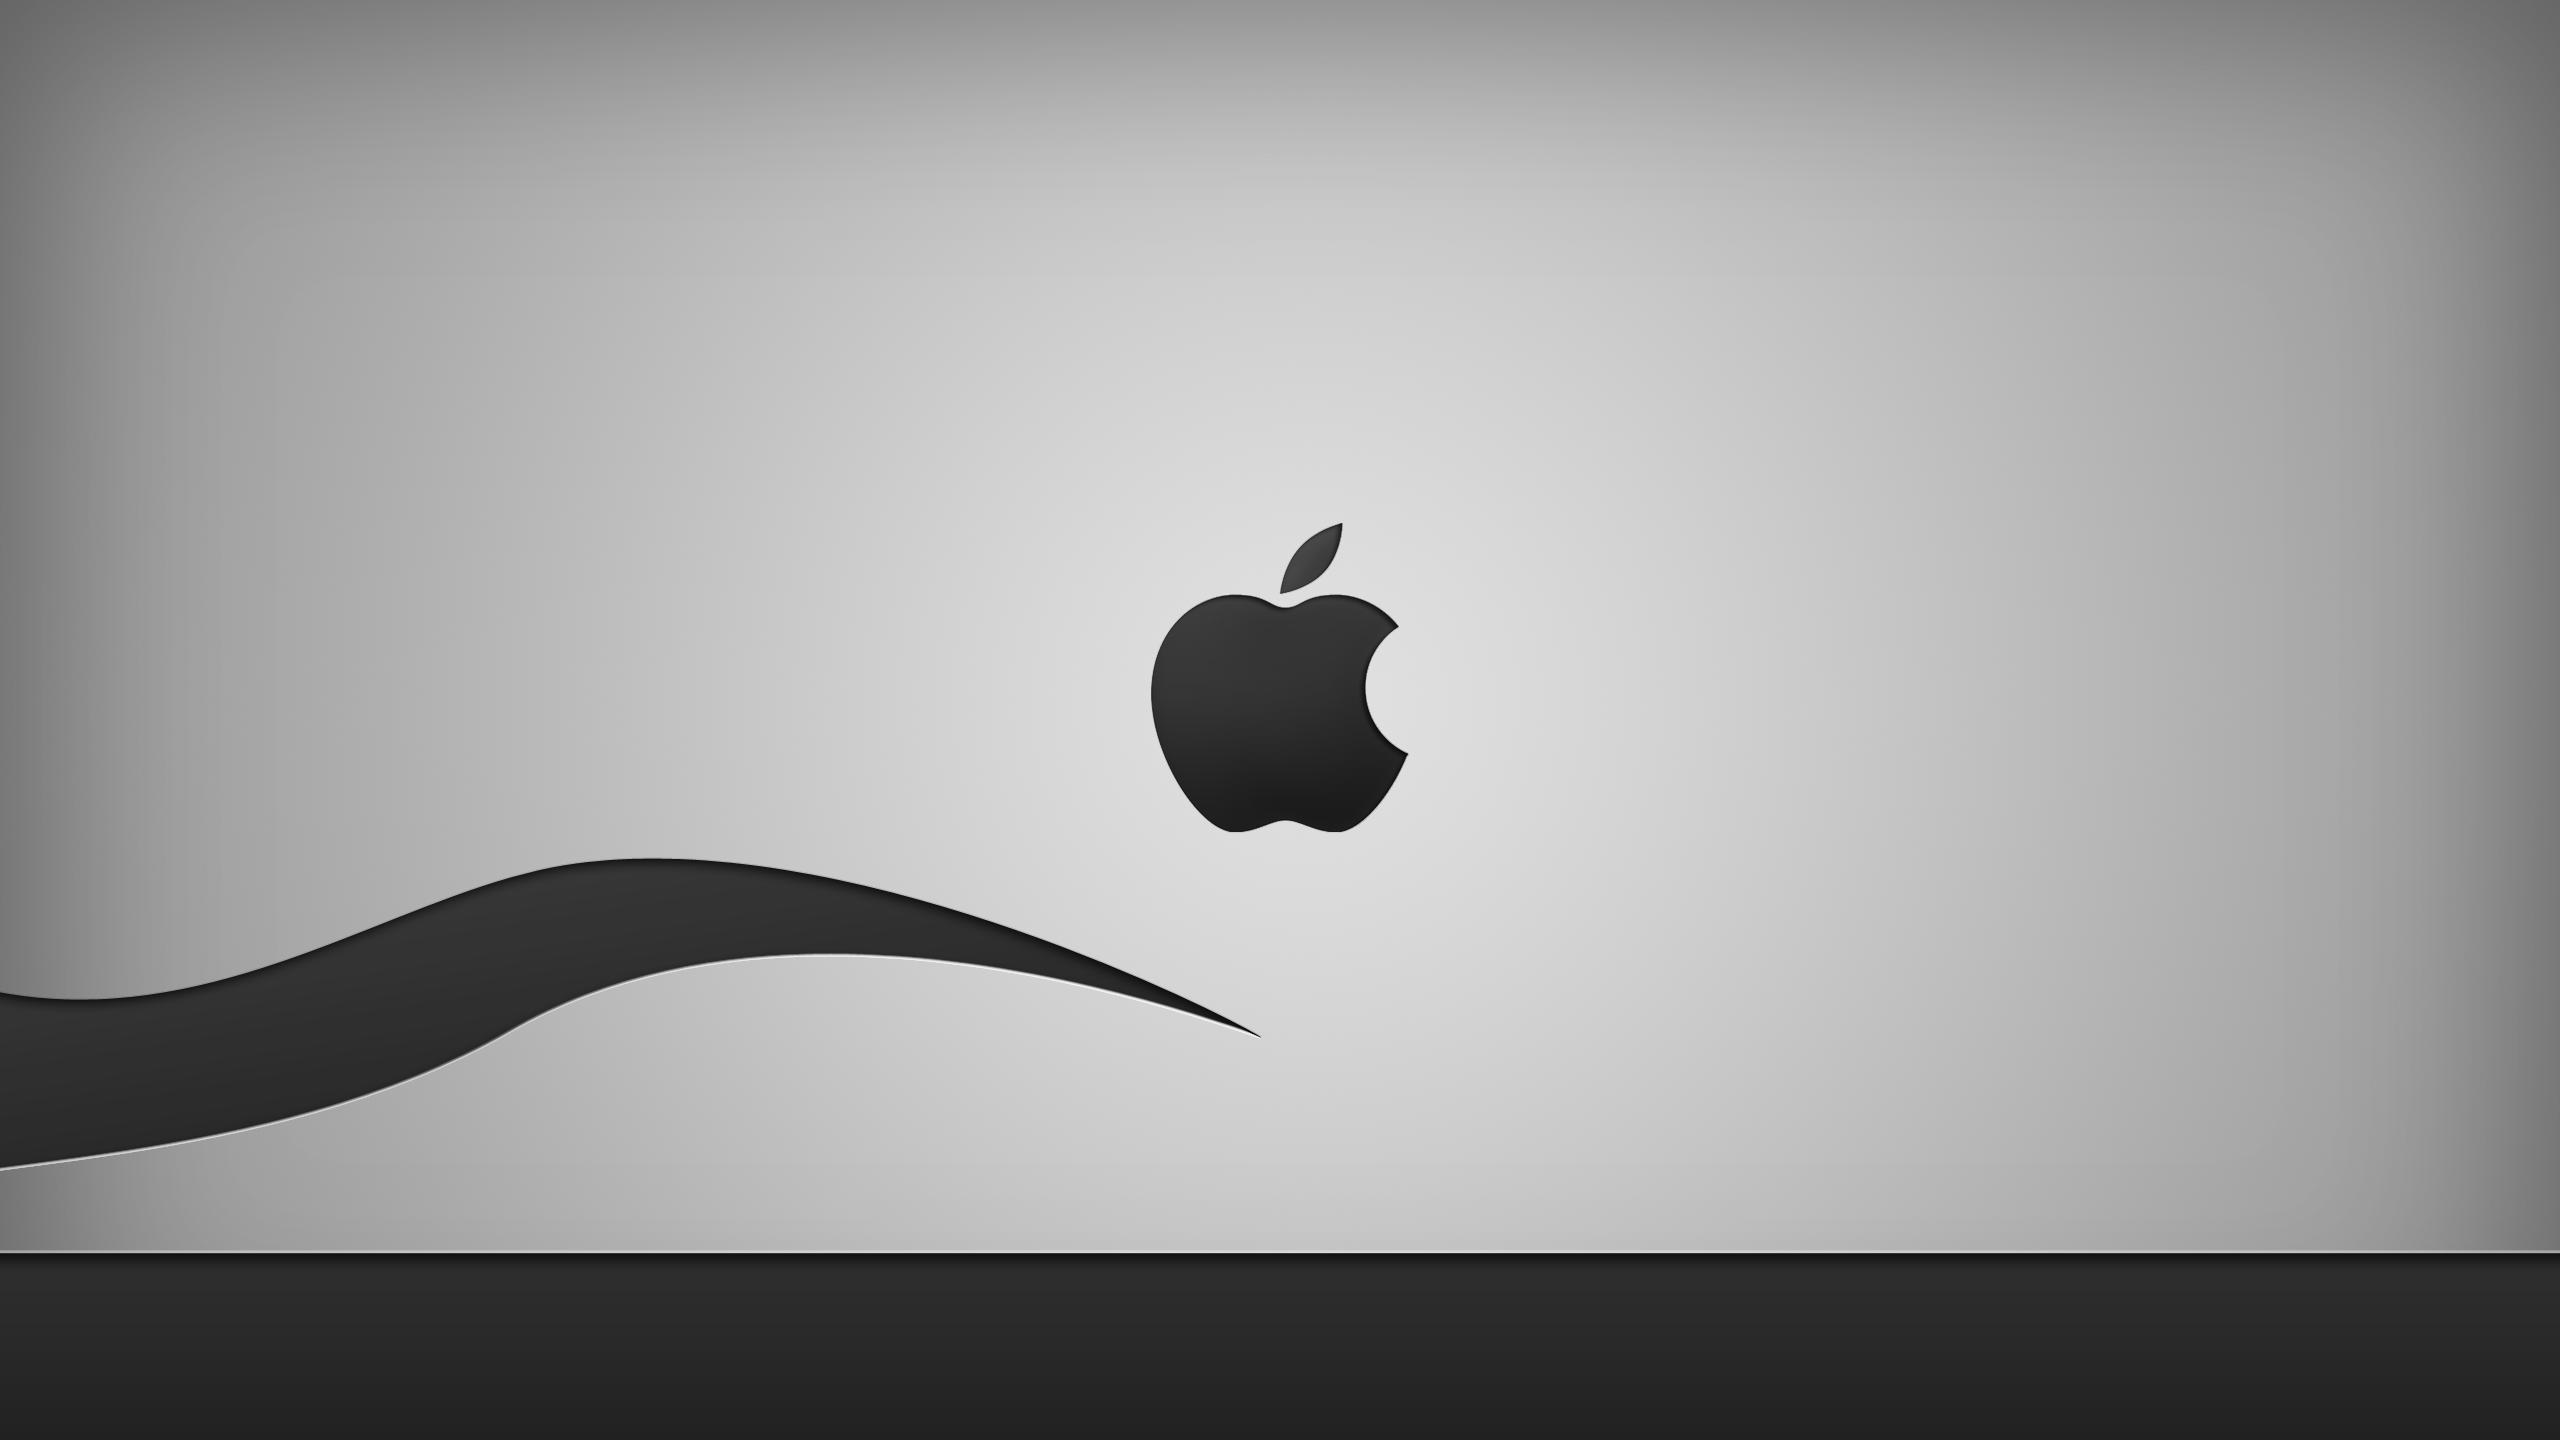 iMac Wallpaper